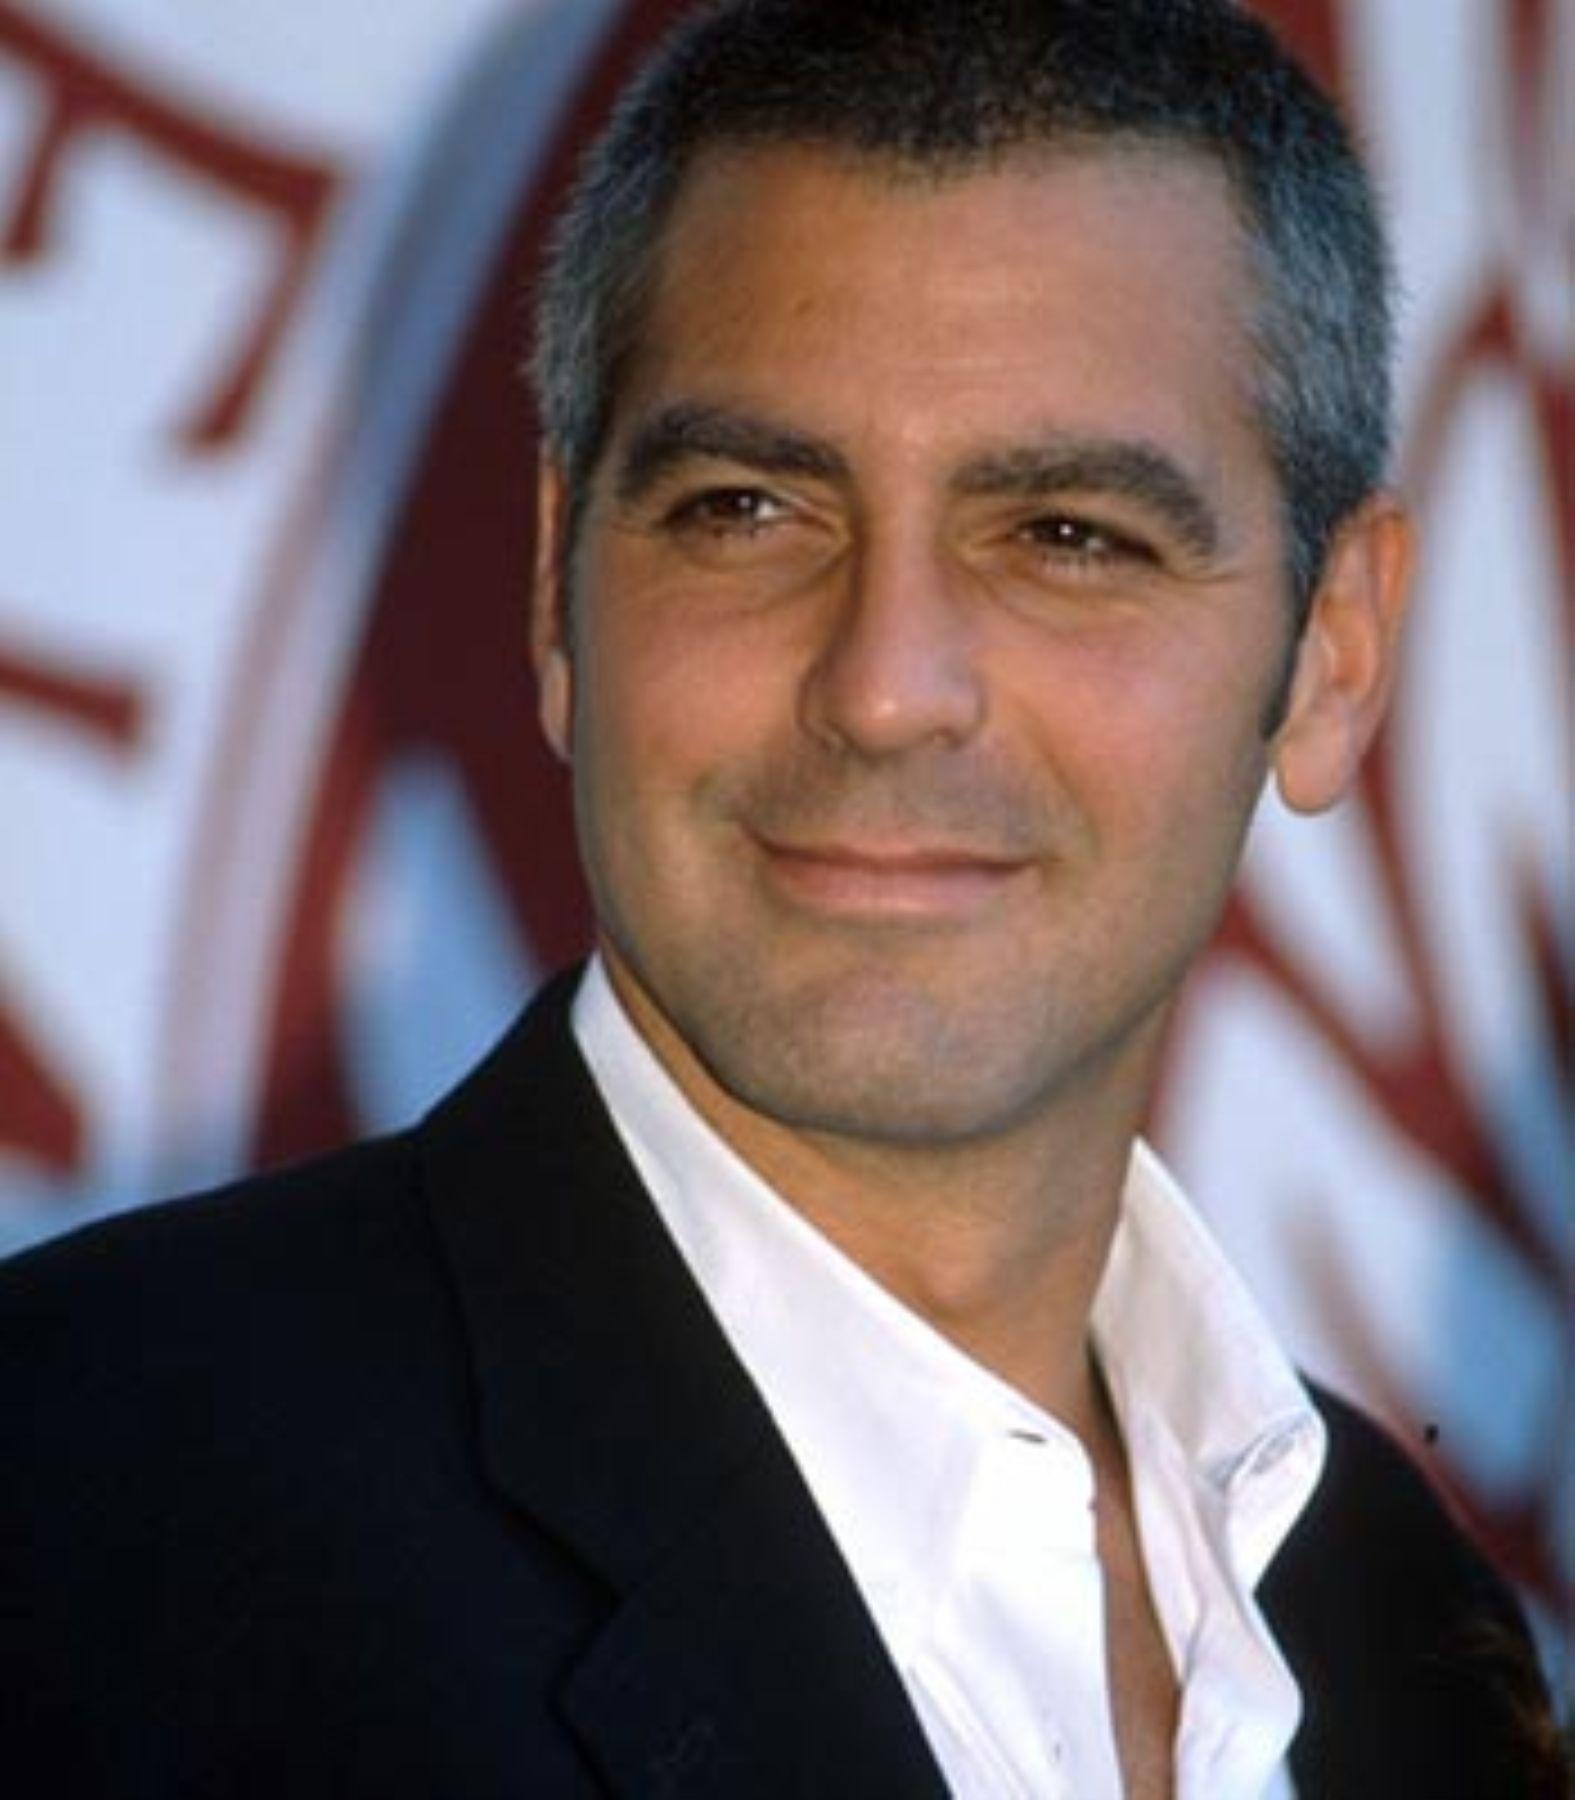 George Clooney. INTERNET/Medios